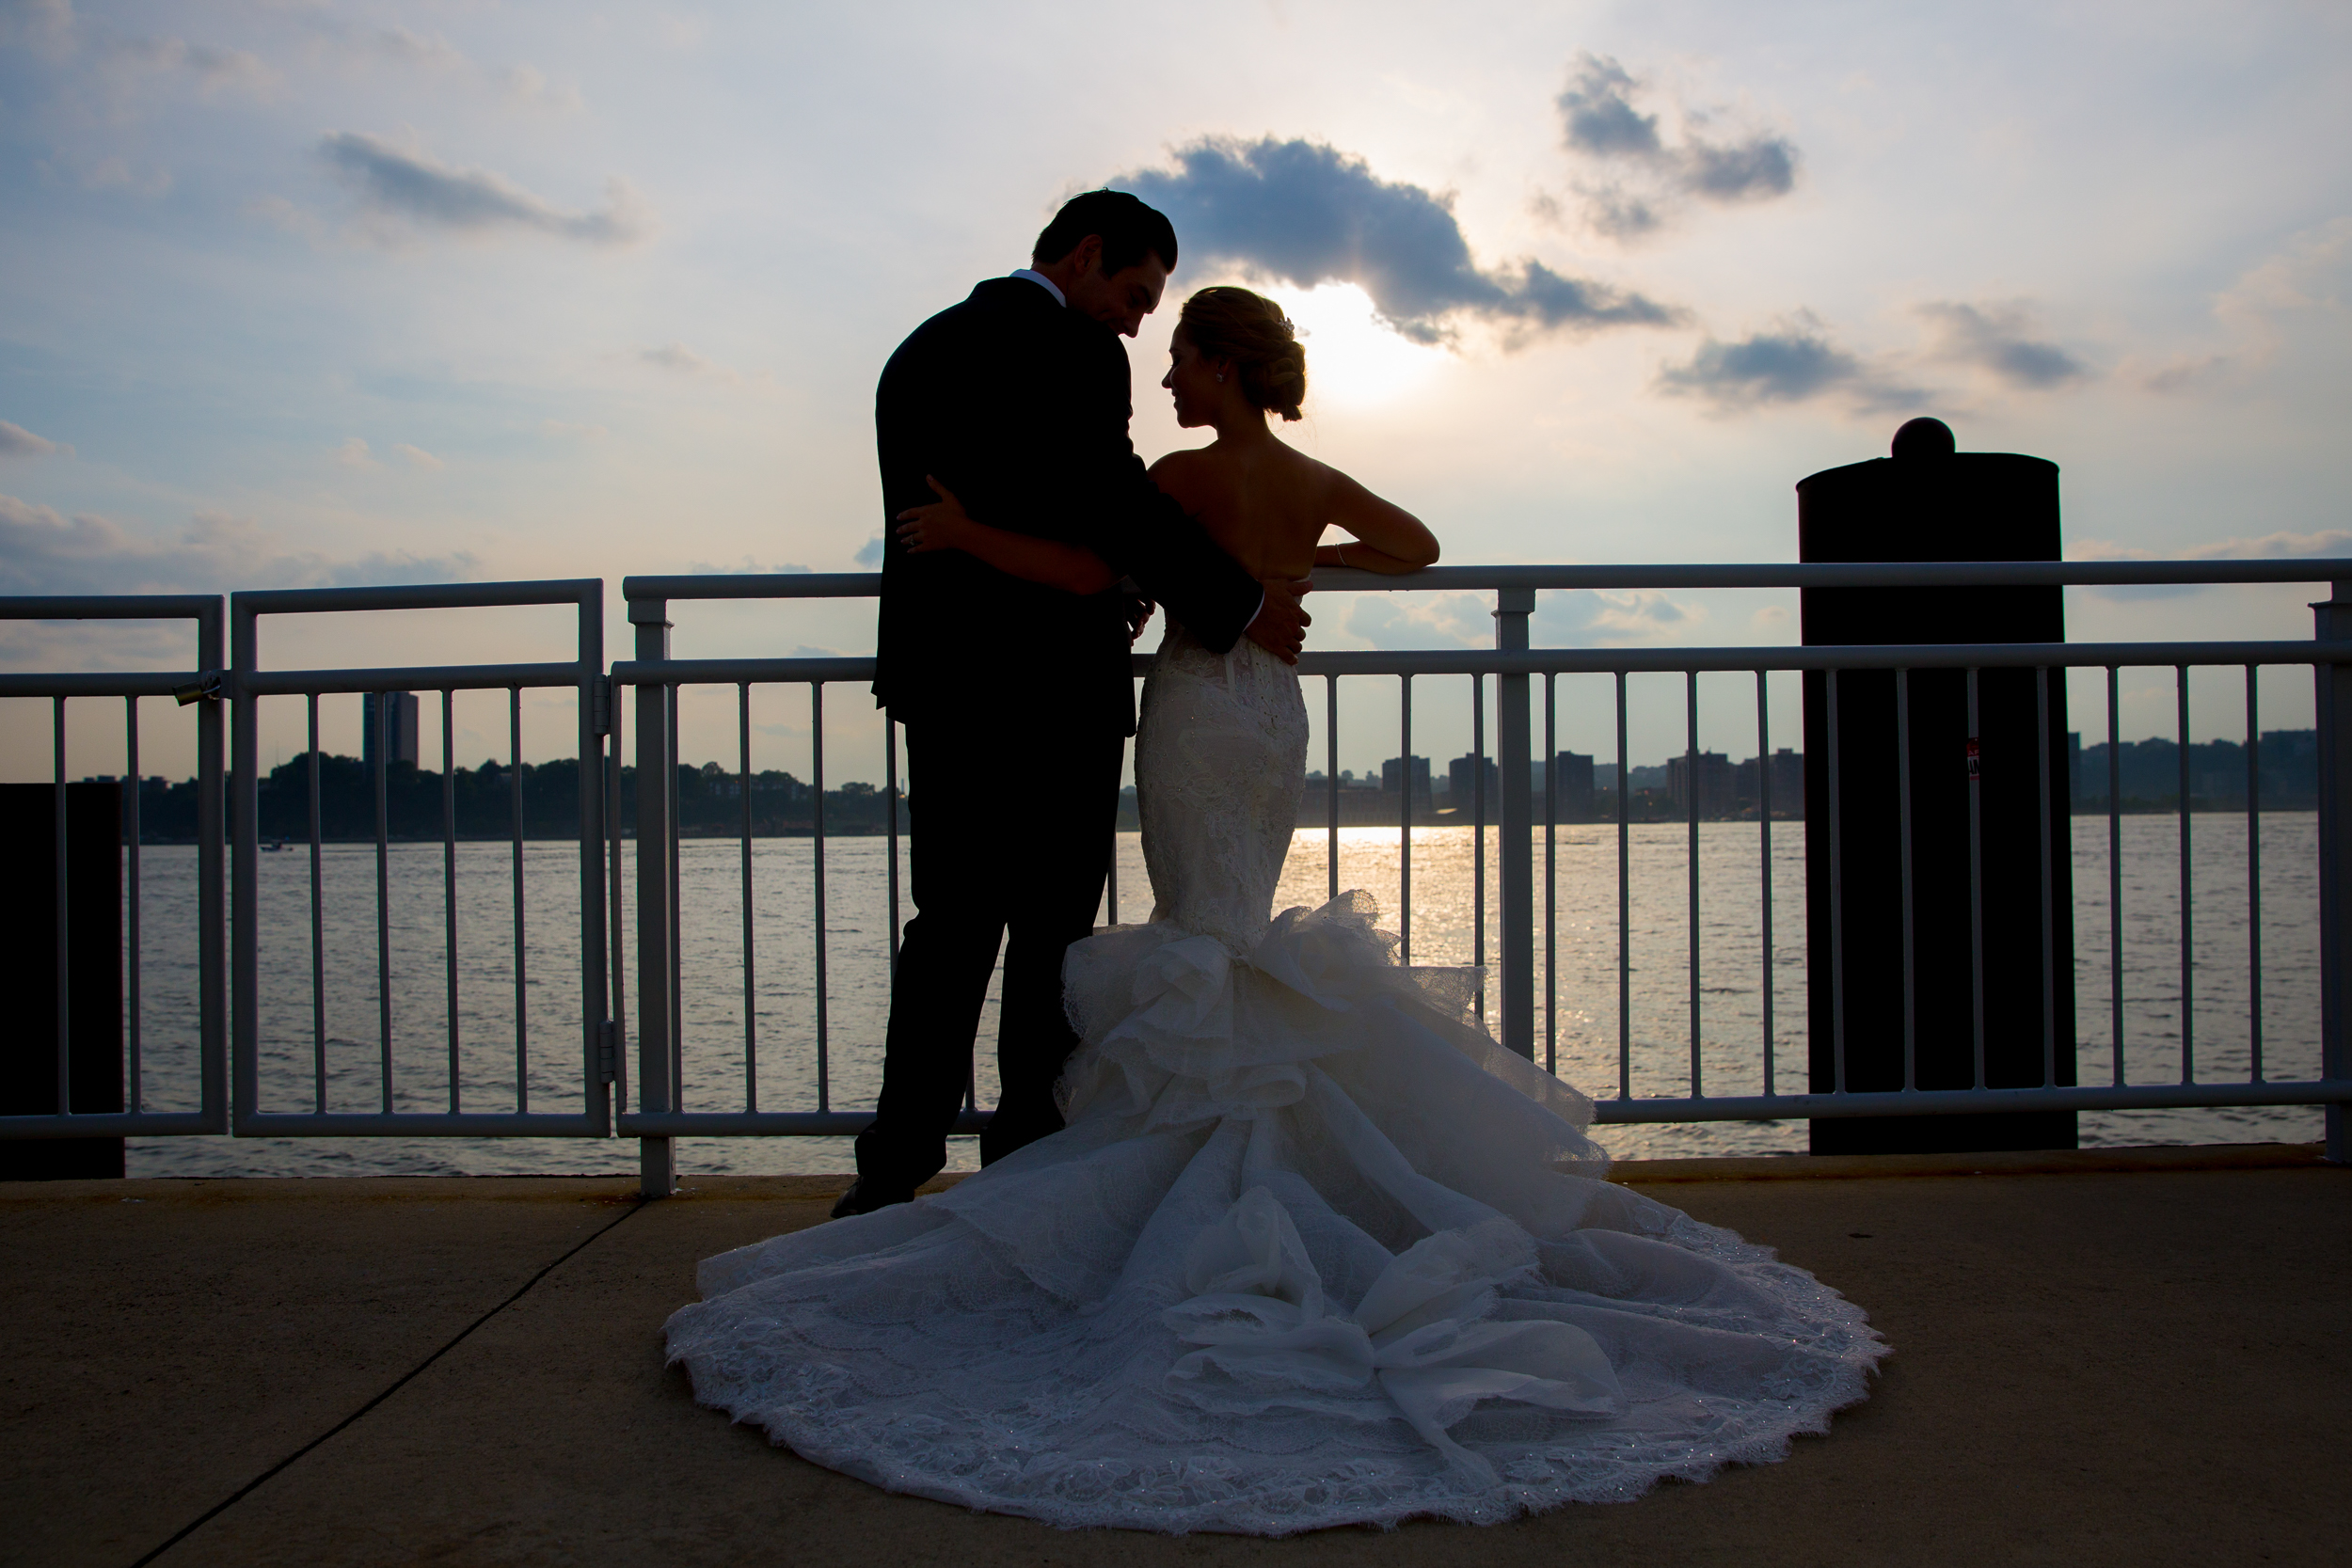 Ceci_New_York_Style_Luxury_Custom_Summer_Wedding_CeciBride_Letterpress_NewYork_Foil_Lighthouse_Chelsea_Piers_43.jpg